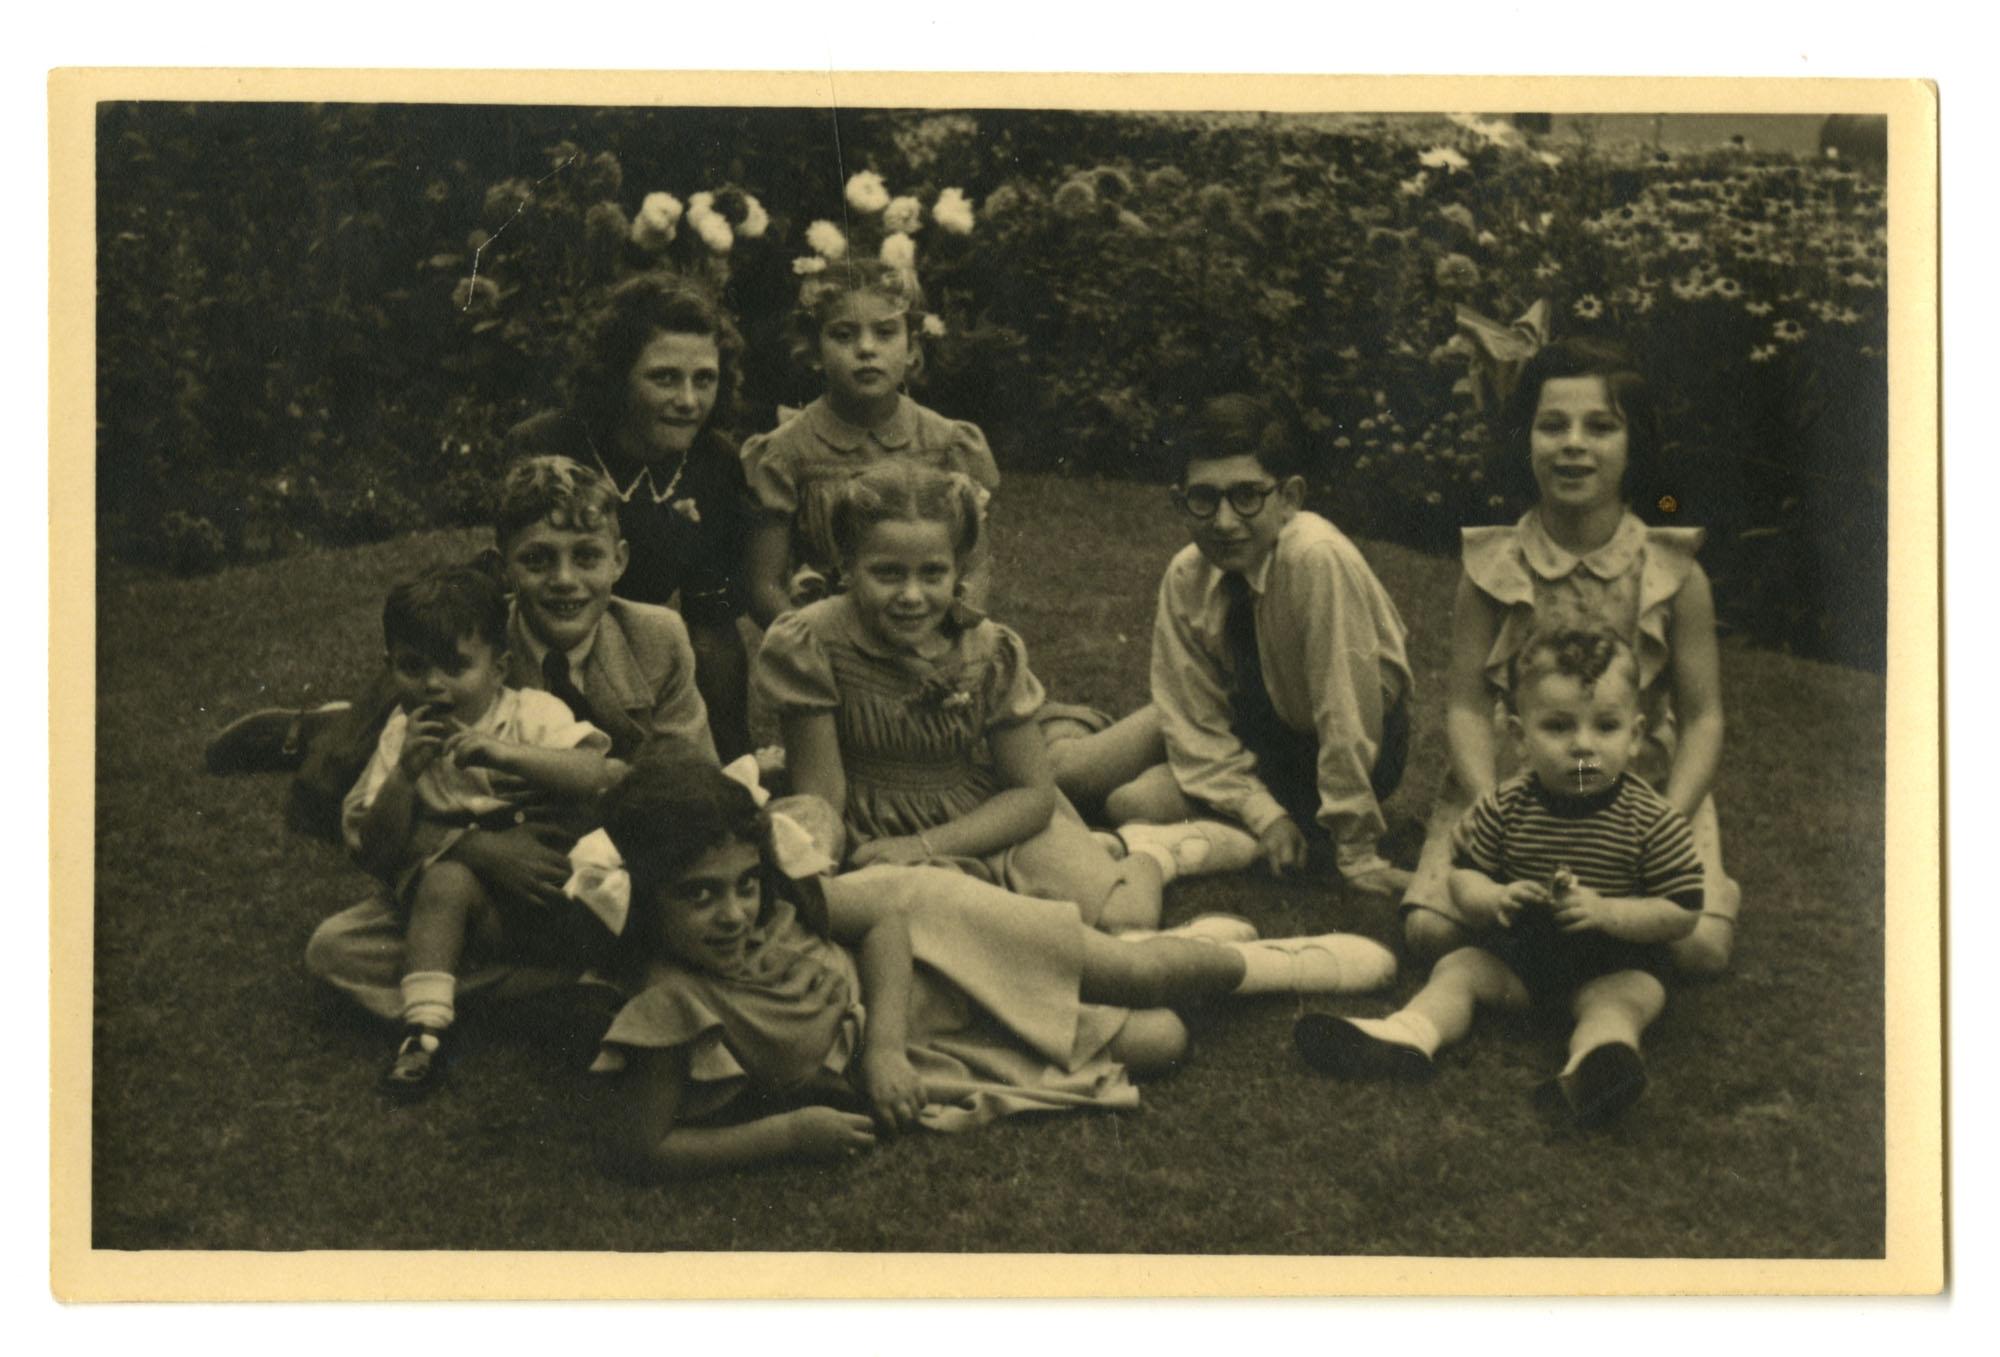 Krant and DeLeeuw families, 1947